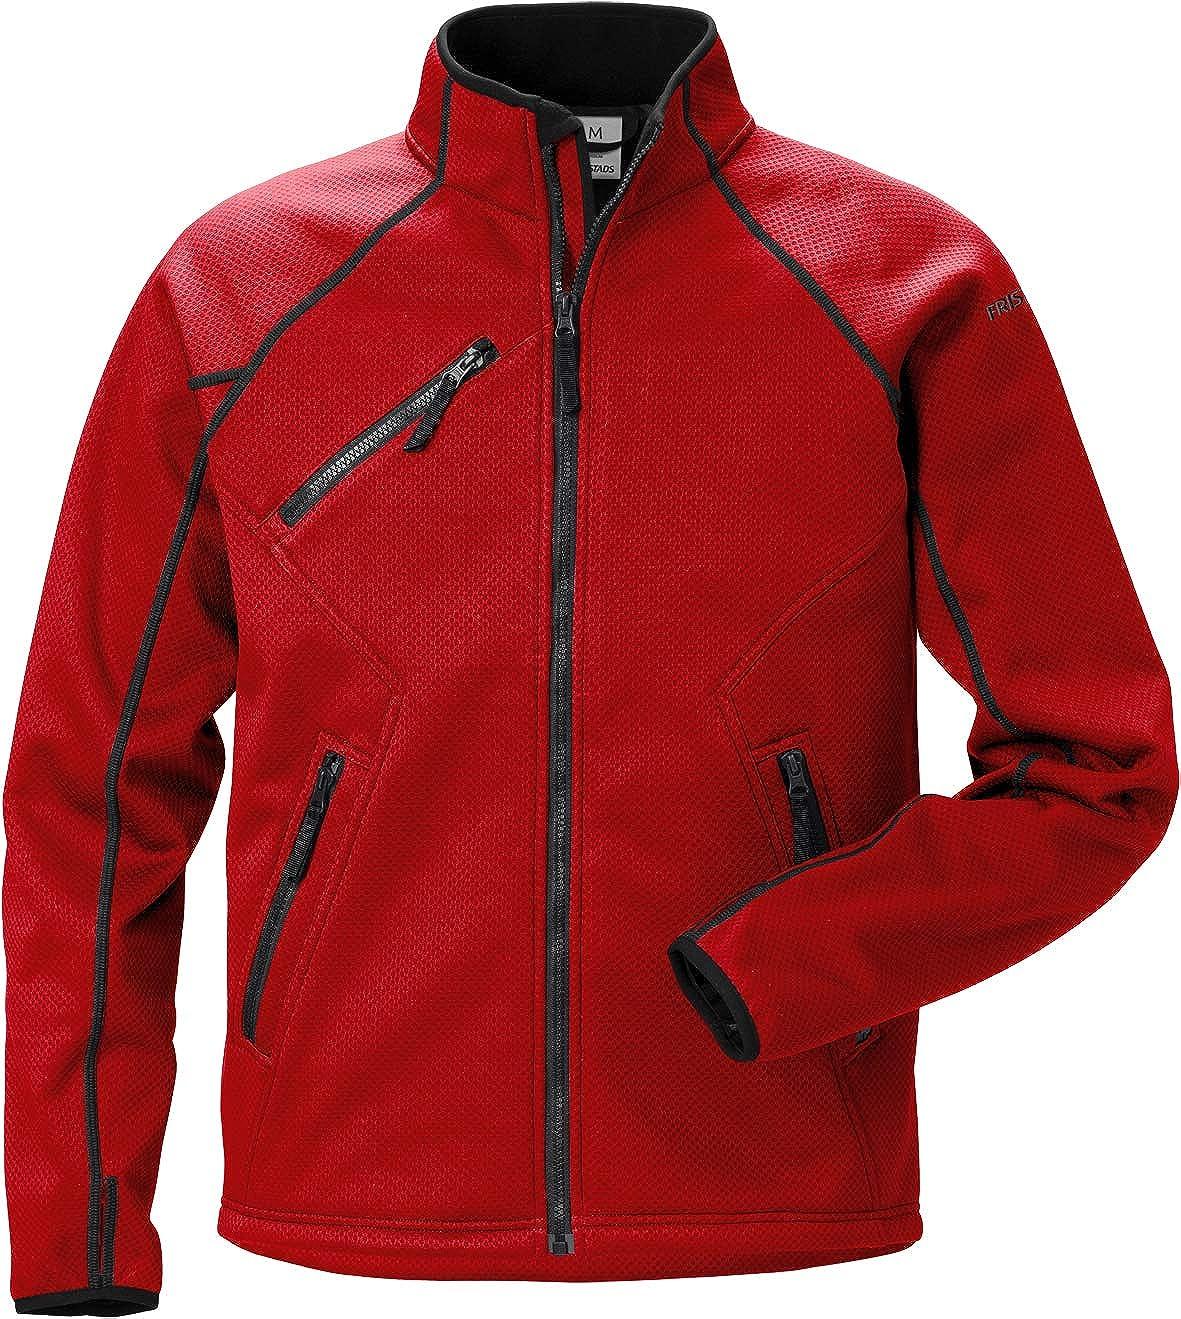 Fristads Workwear 120962 Mens Jacket